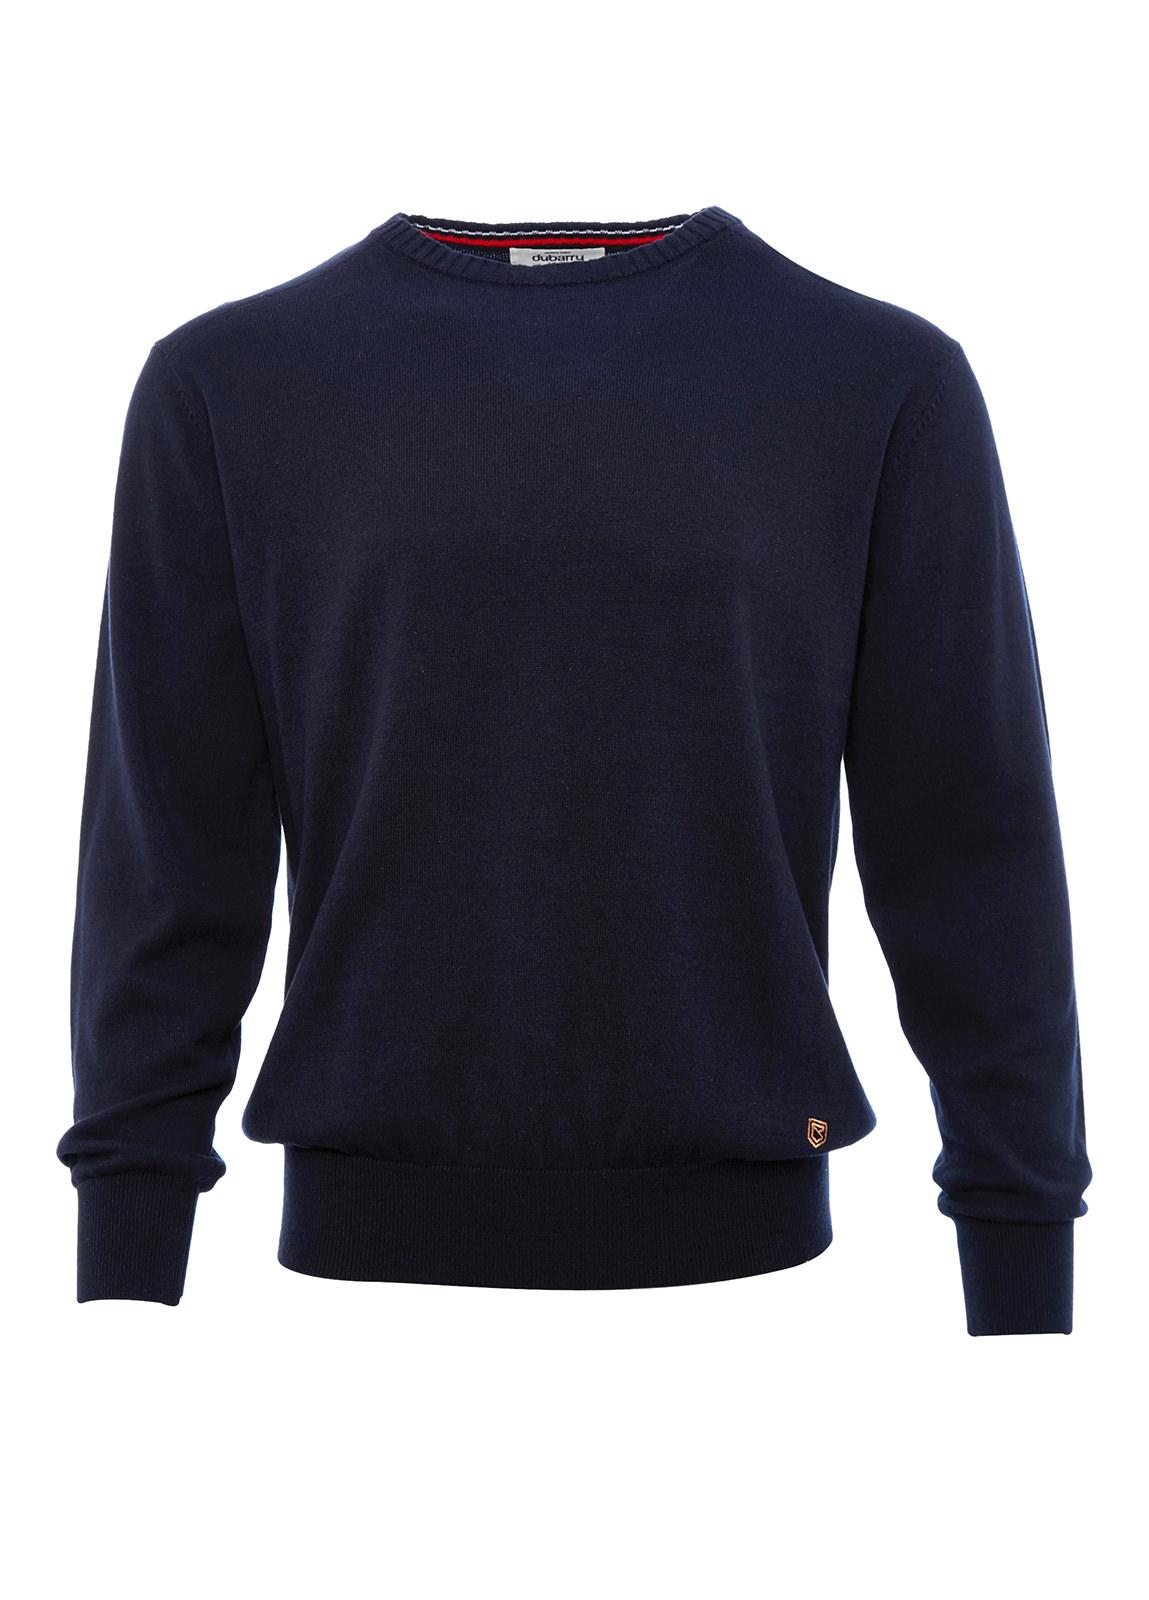 Baldoyle sweater - Navy